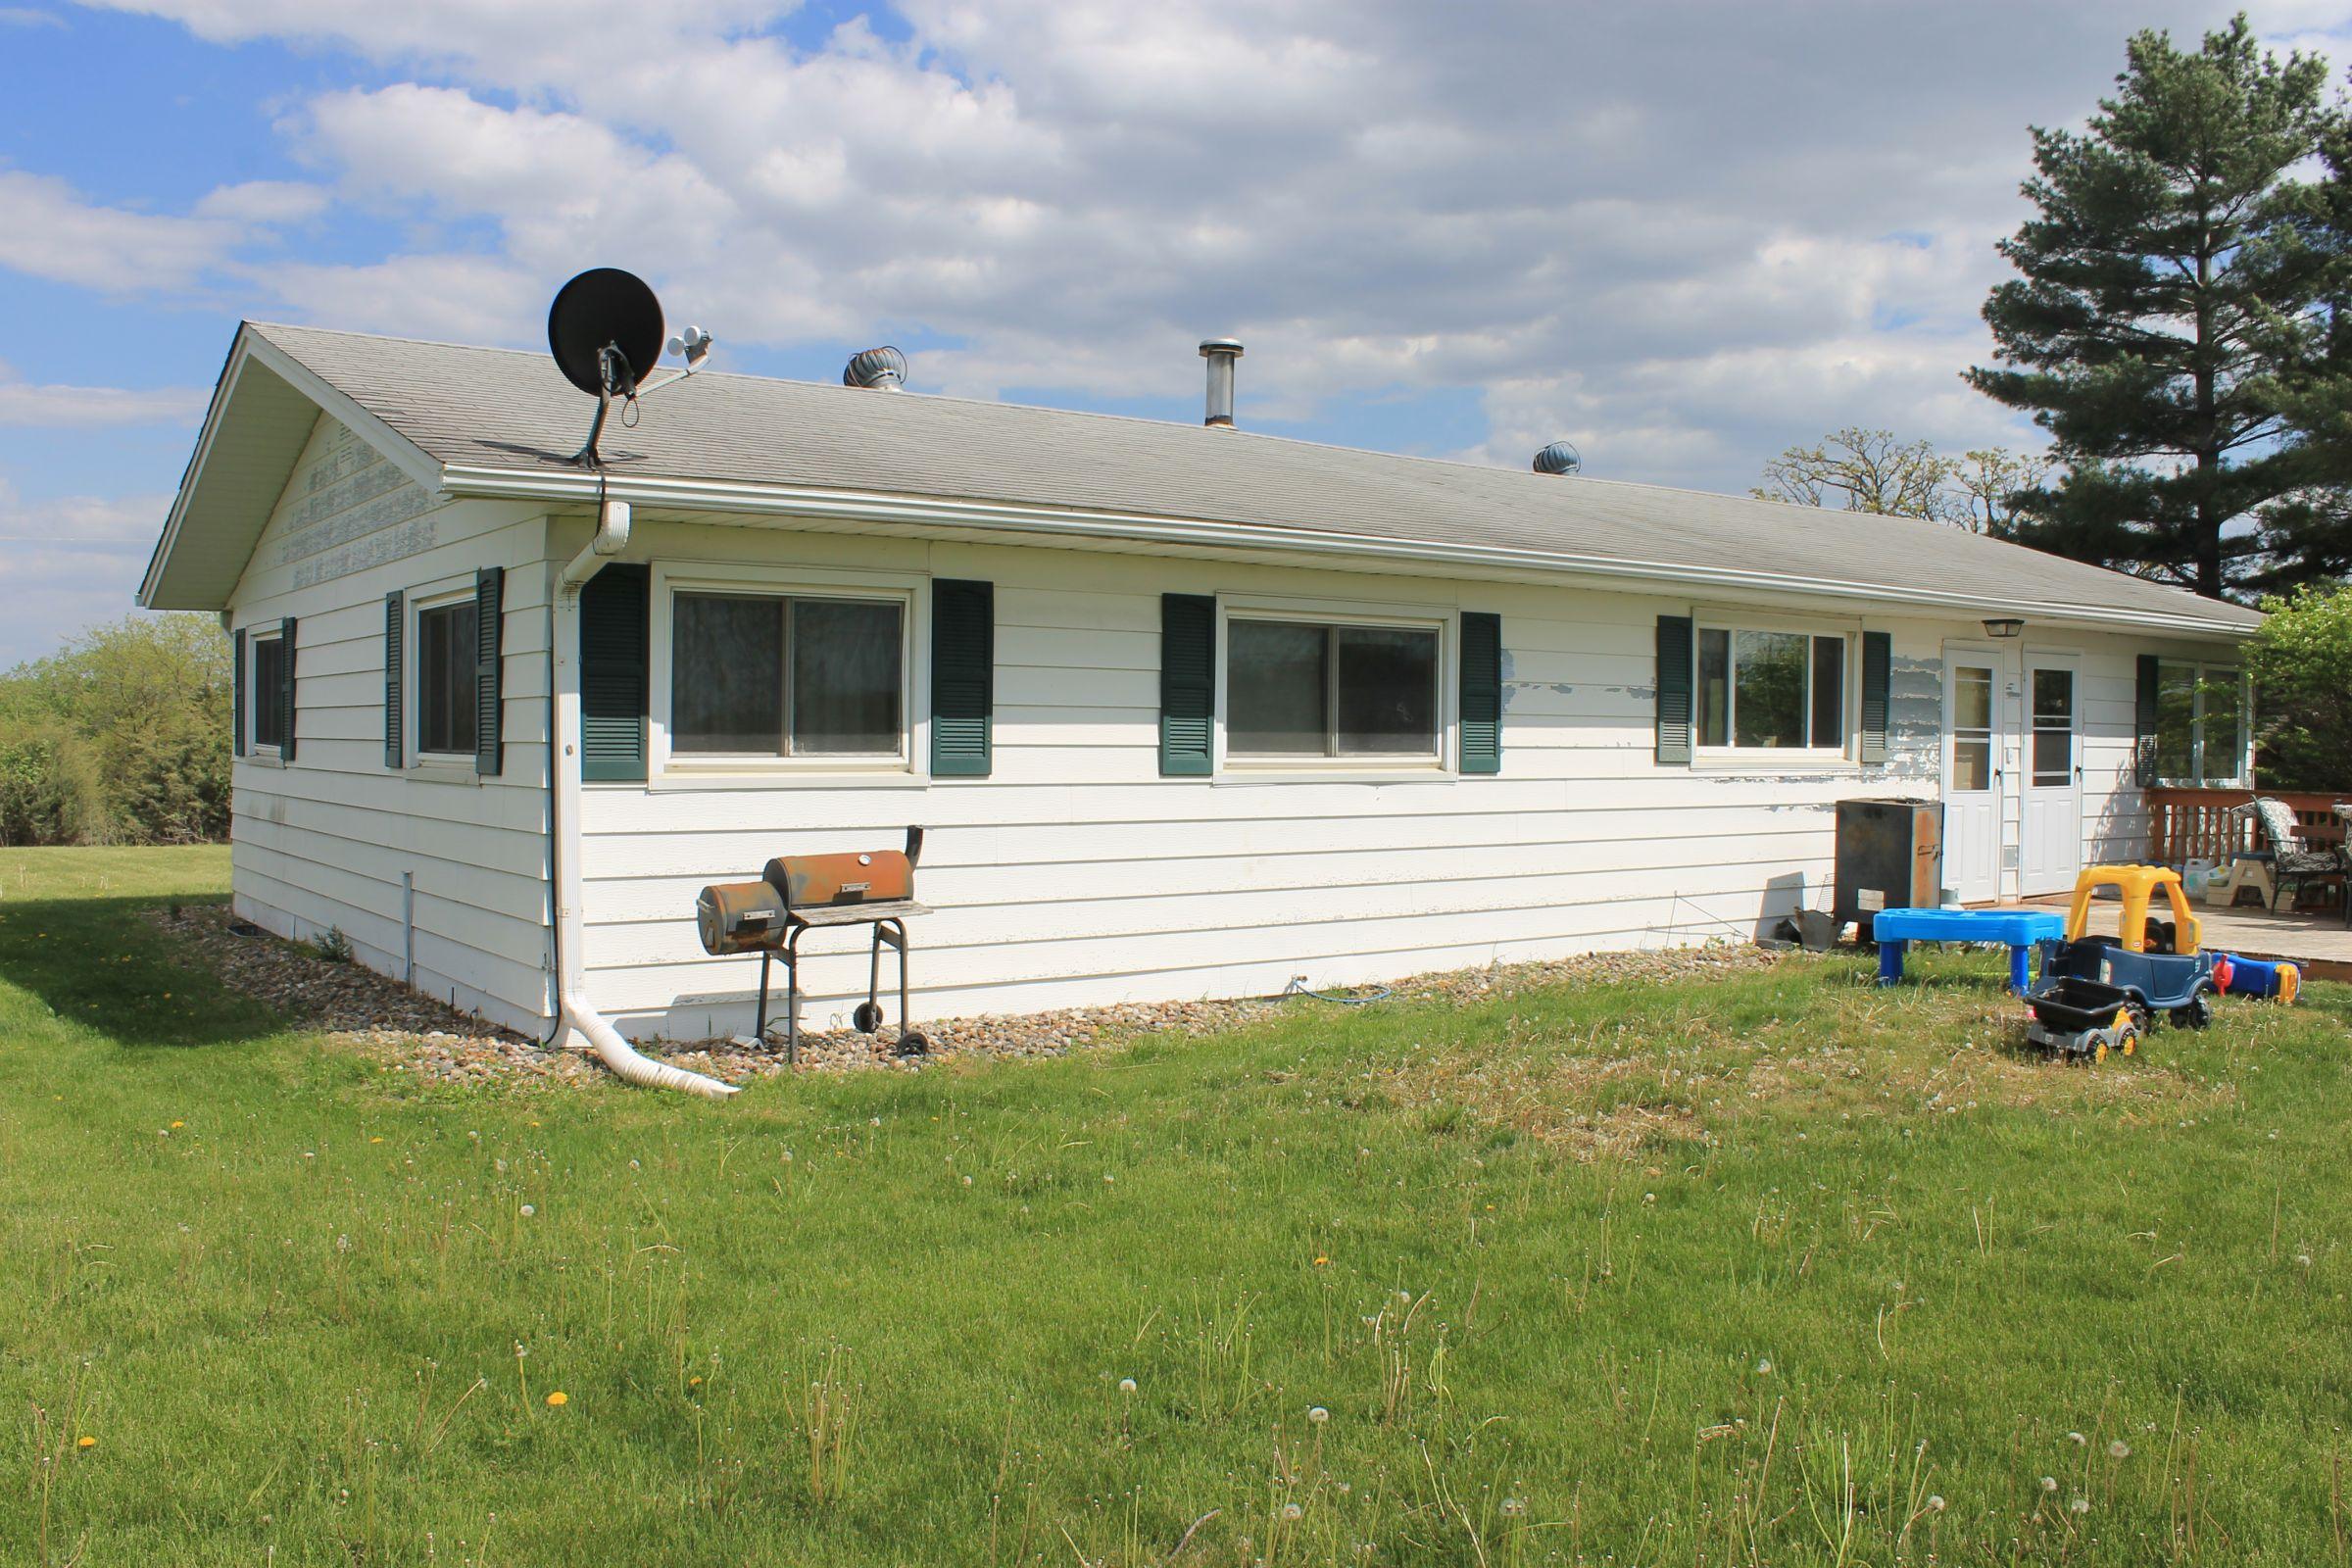 residential-development-land-warren-county-iowa-38-acres-listing-number-15513-10-2021-05-06-210443.JPG